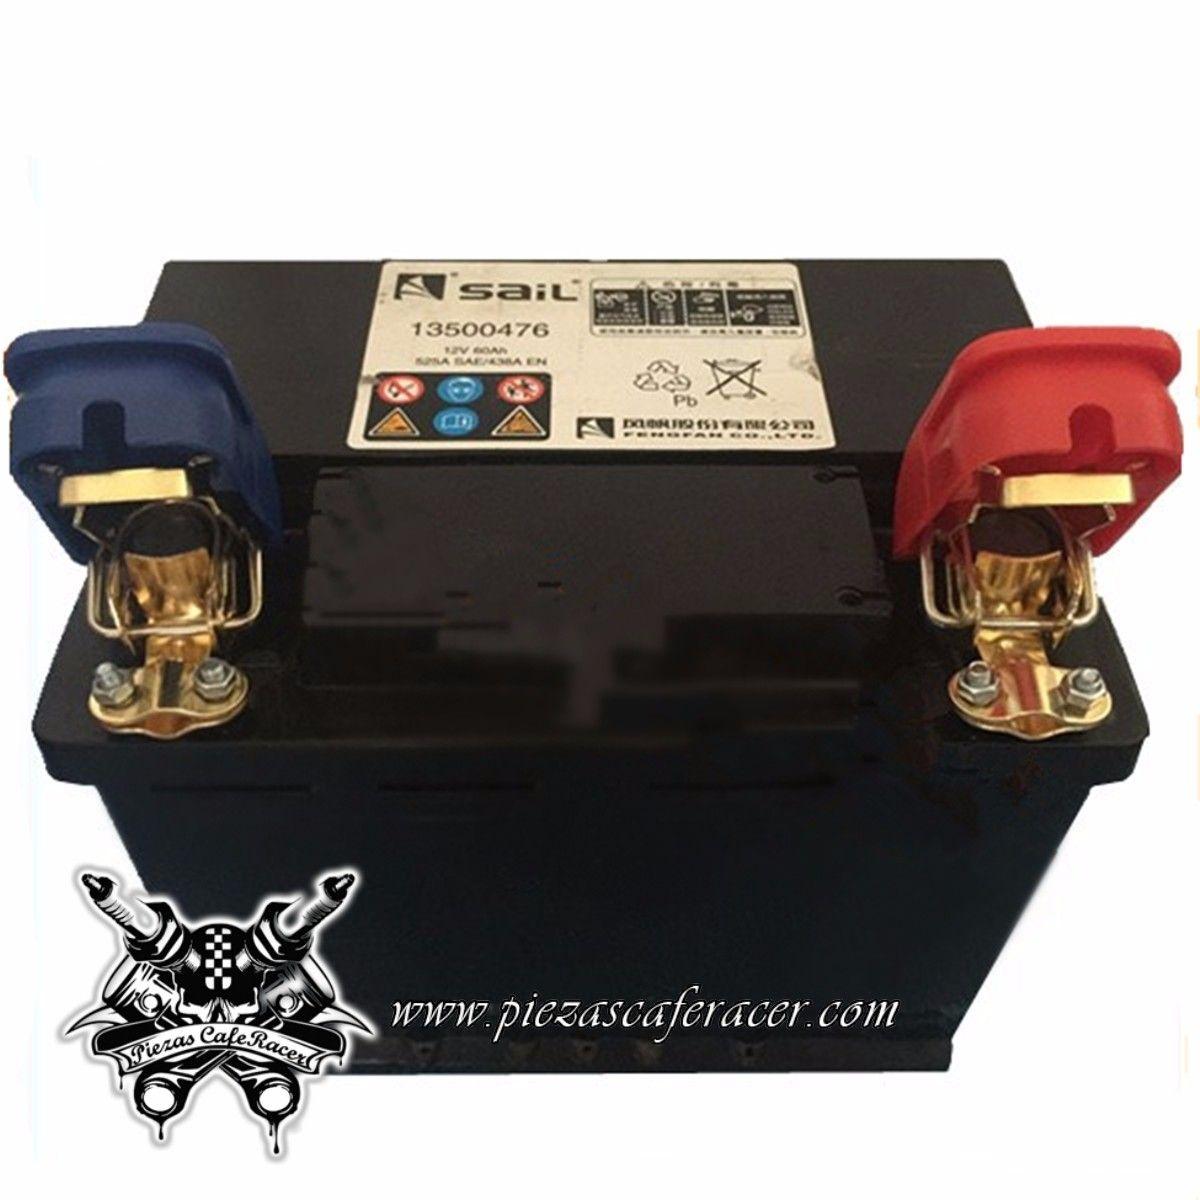 Juego De Desconectadores Rapidos Para Terminales De Bateria 12v